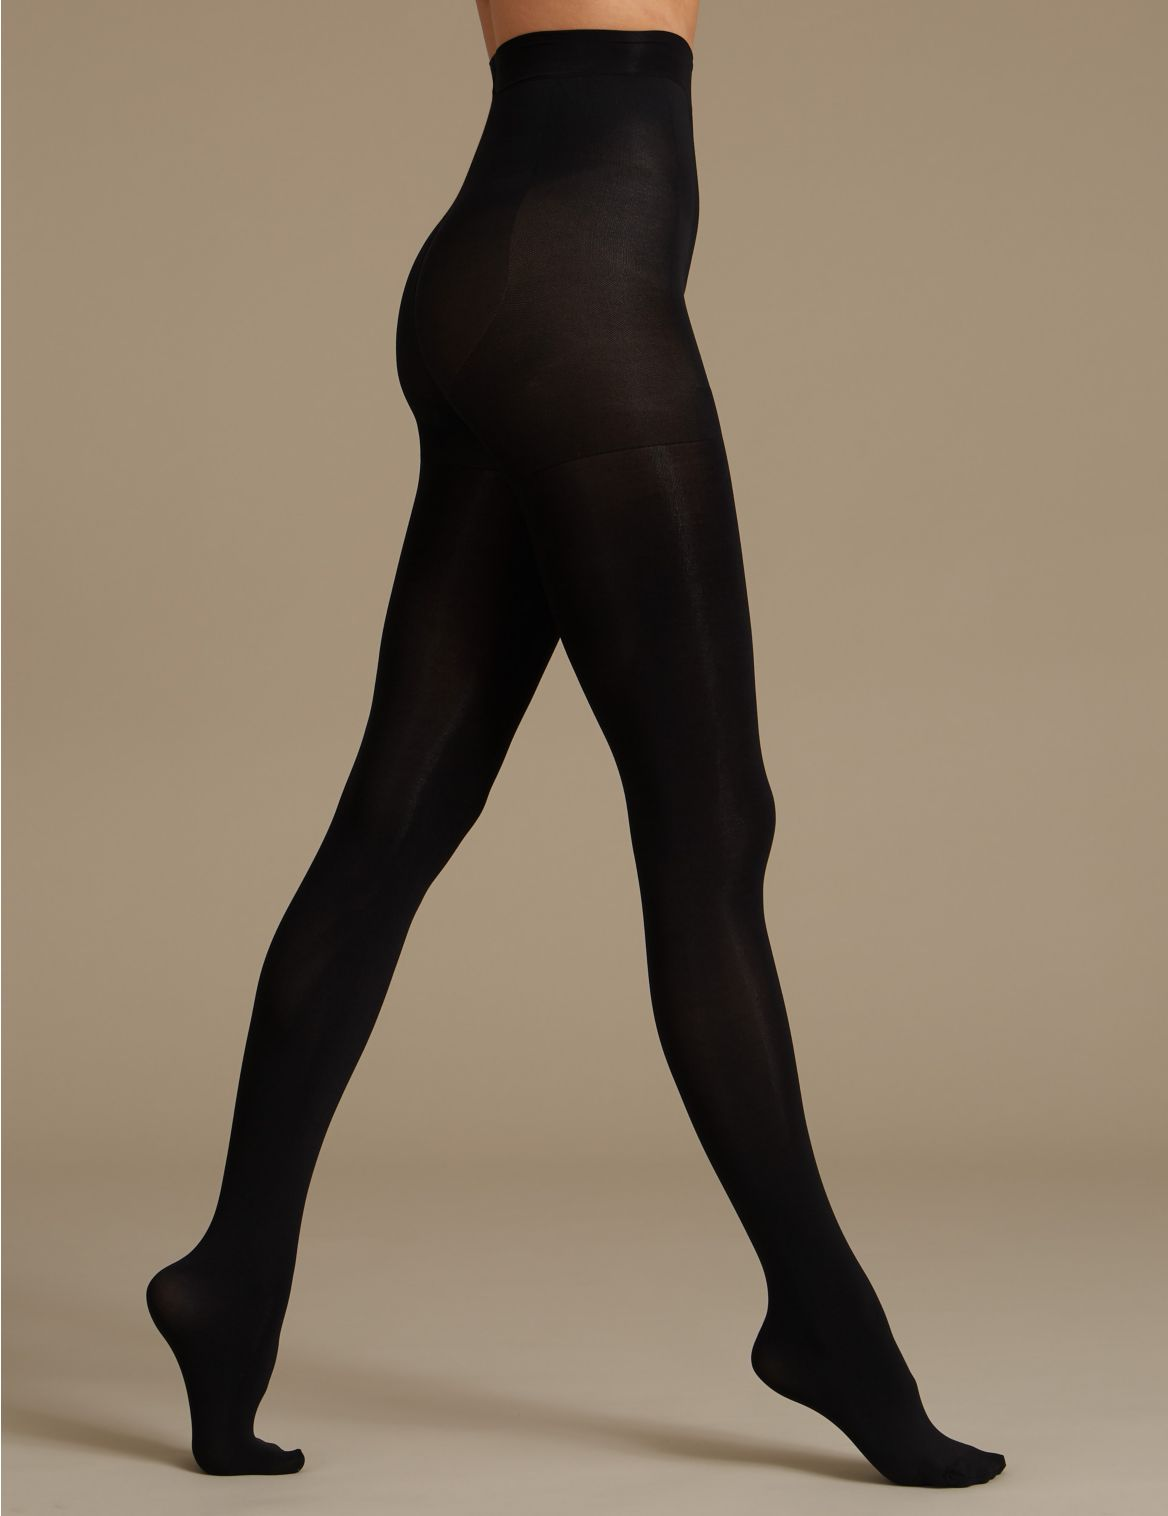 100 Denier Magicwear™ Tights black